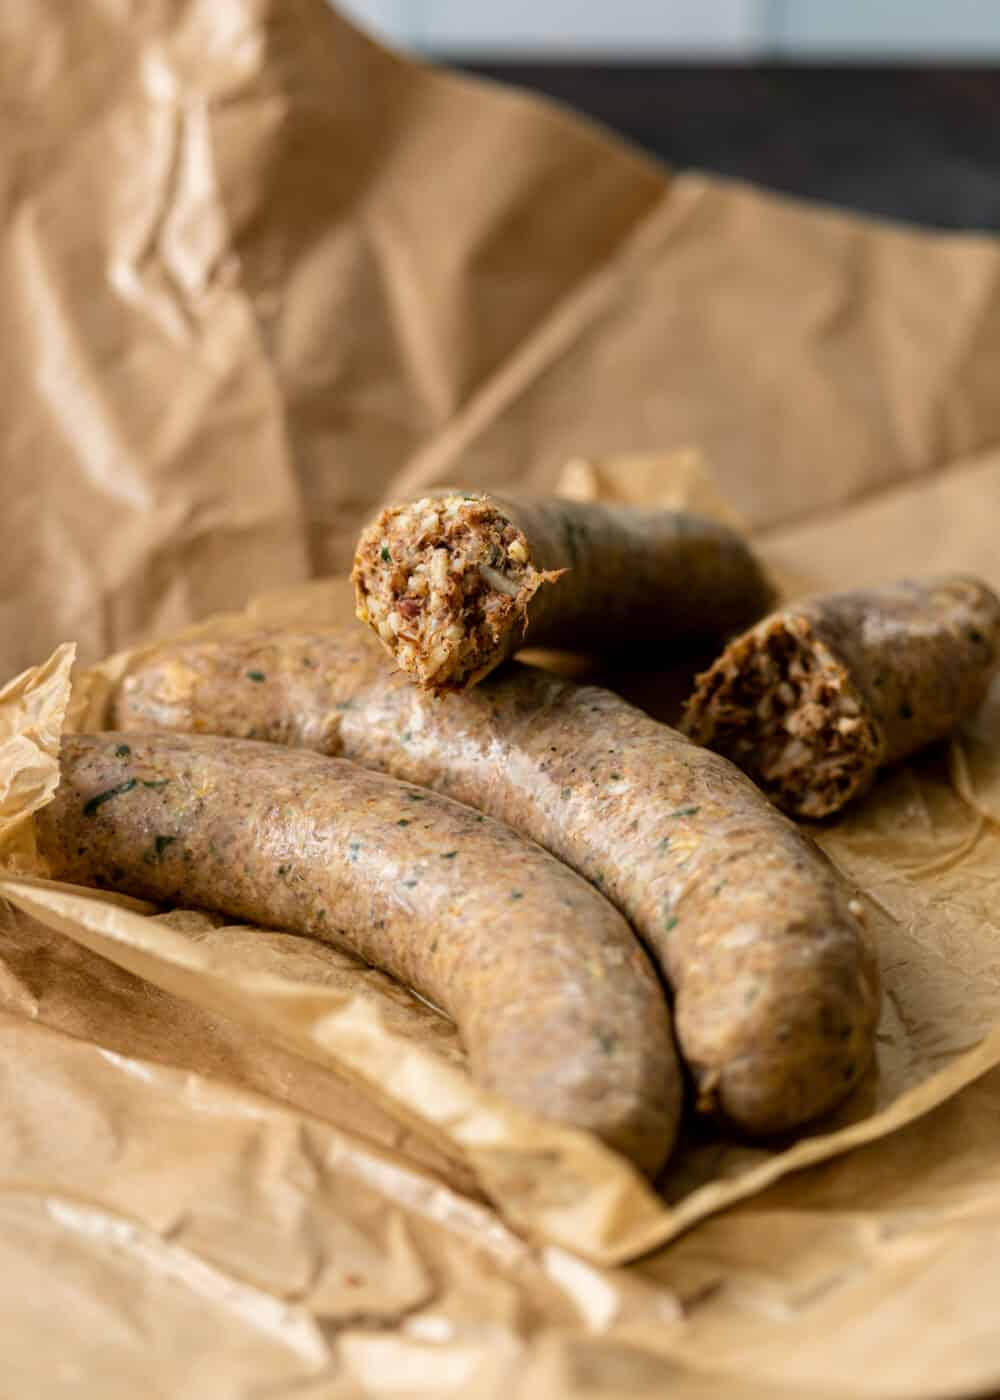 boudin sausage links on butcher paper